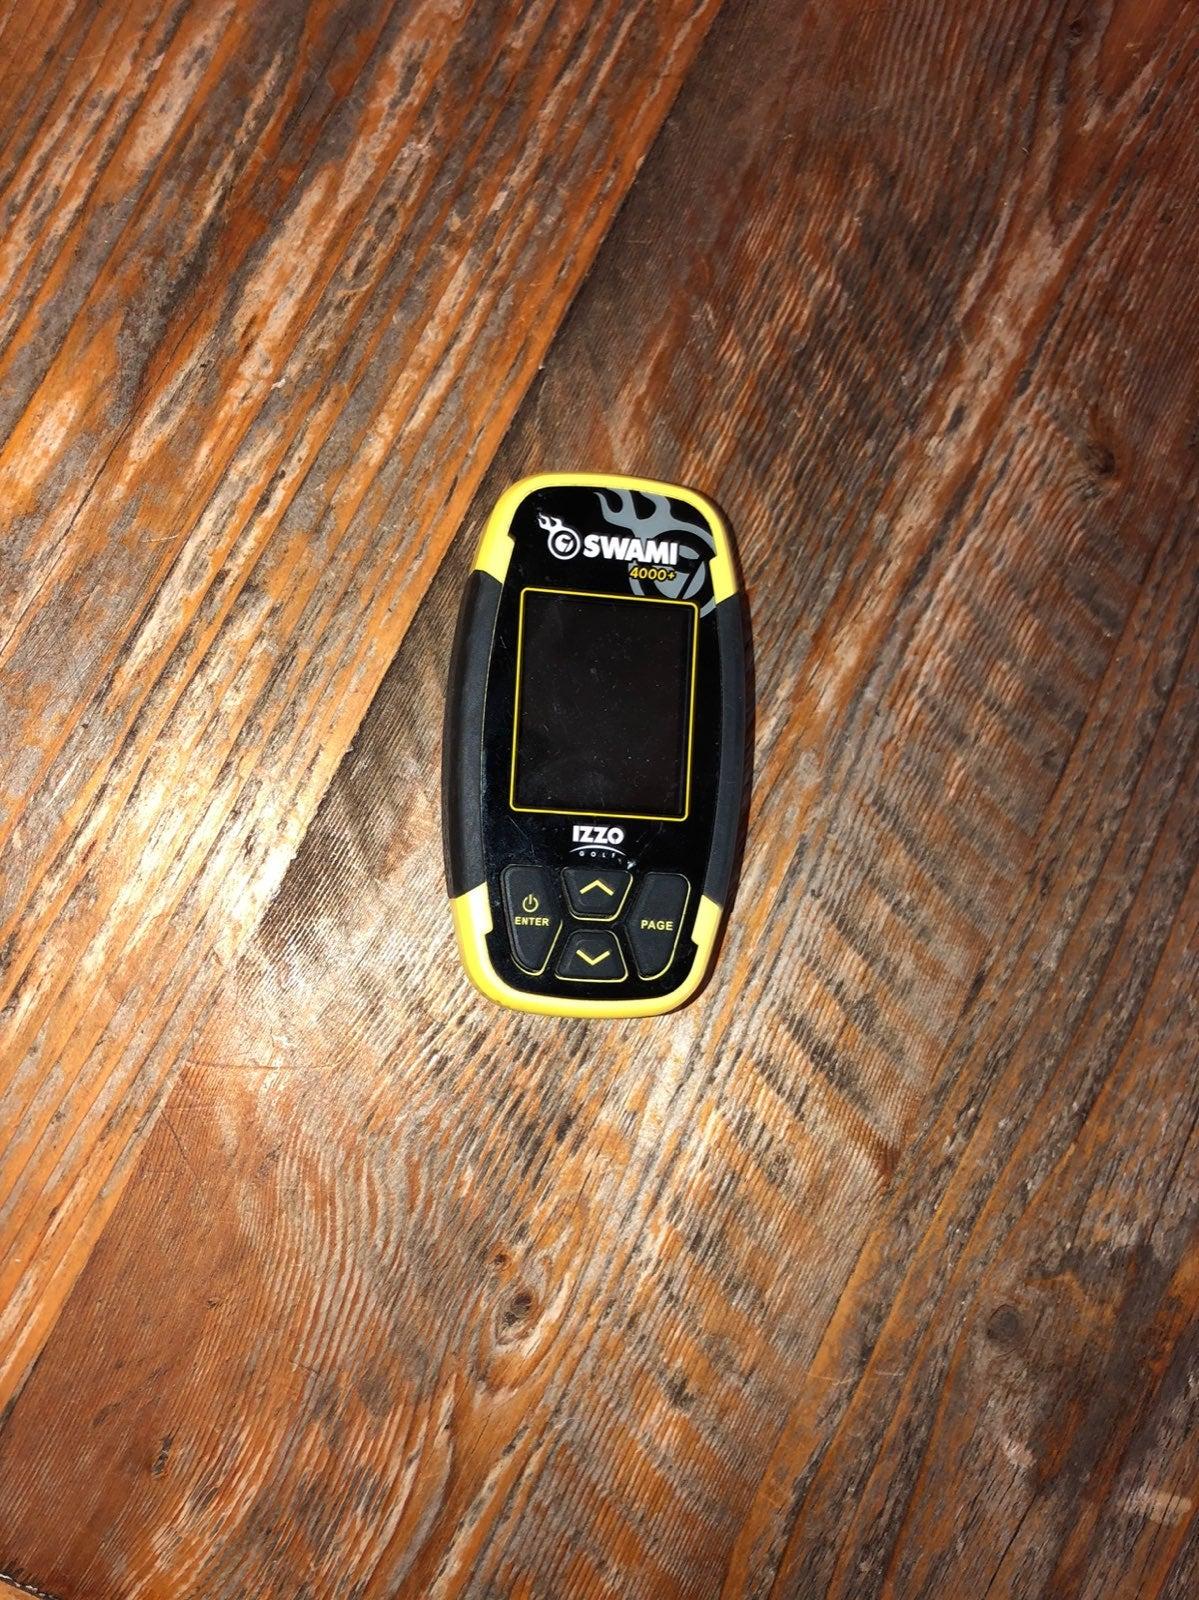 IZZO Golf   Swami 4000 Golf GPS